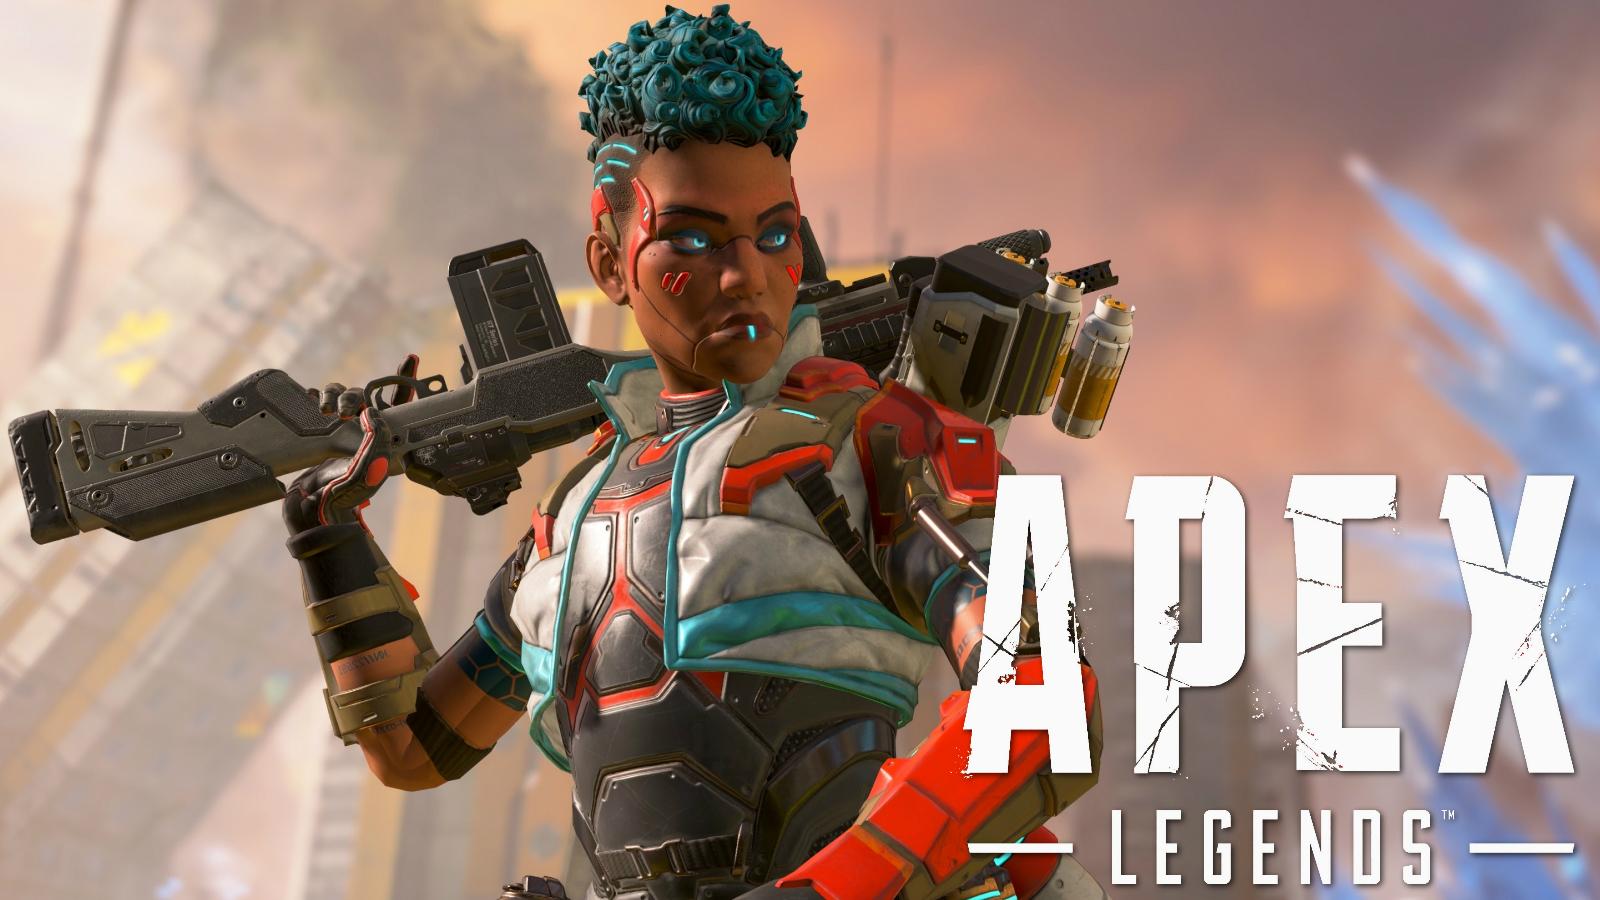 Bangalore skin in Apex Legends